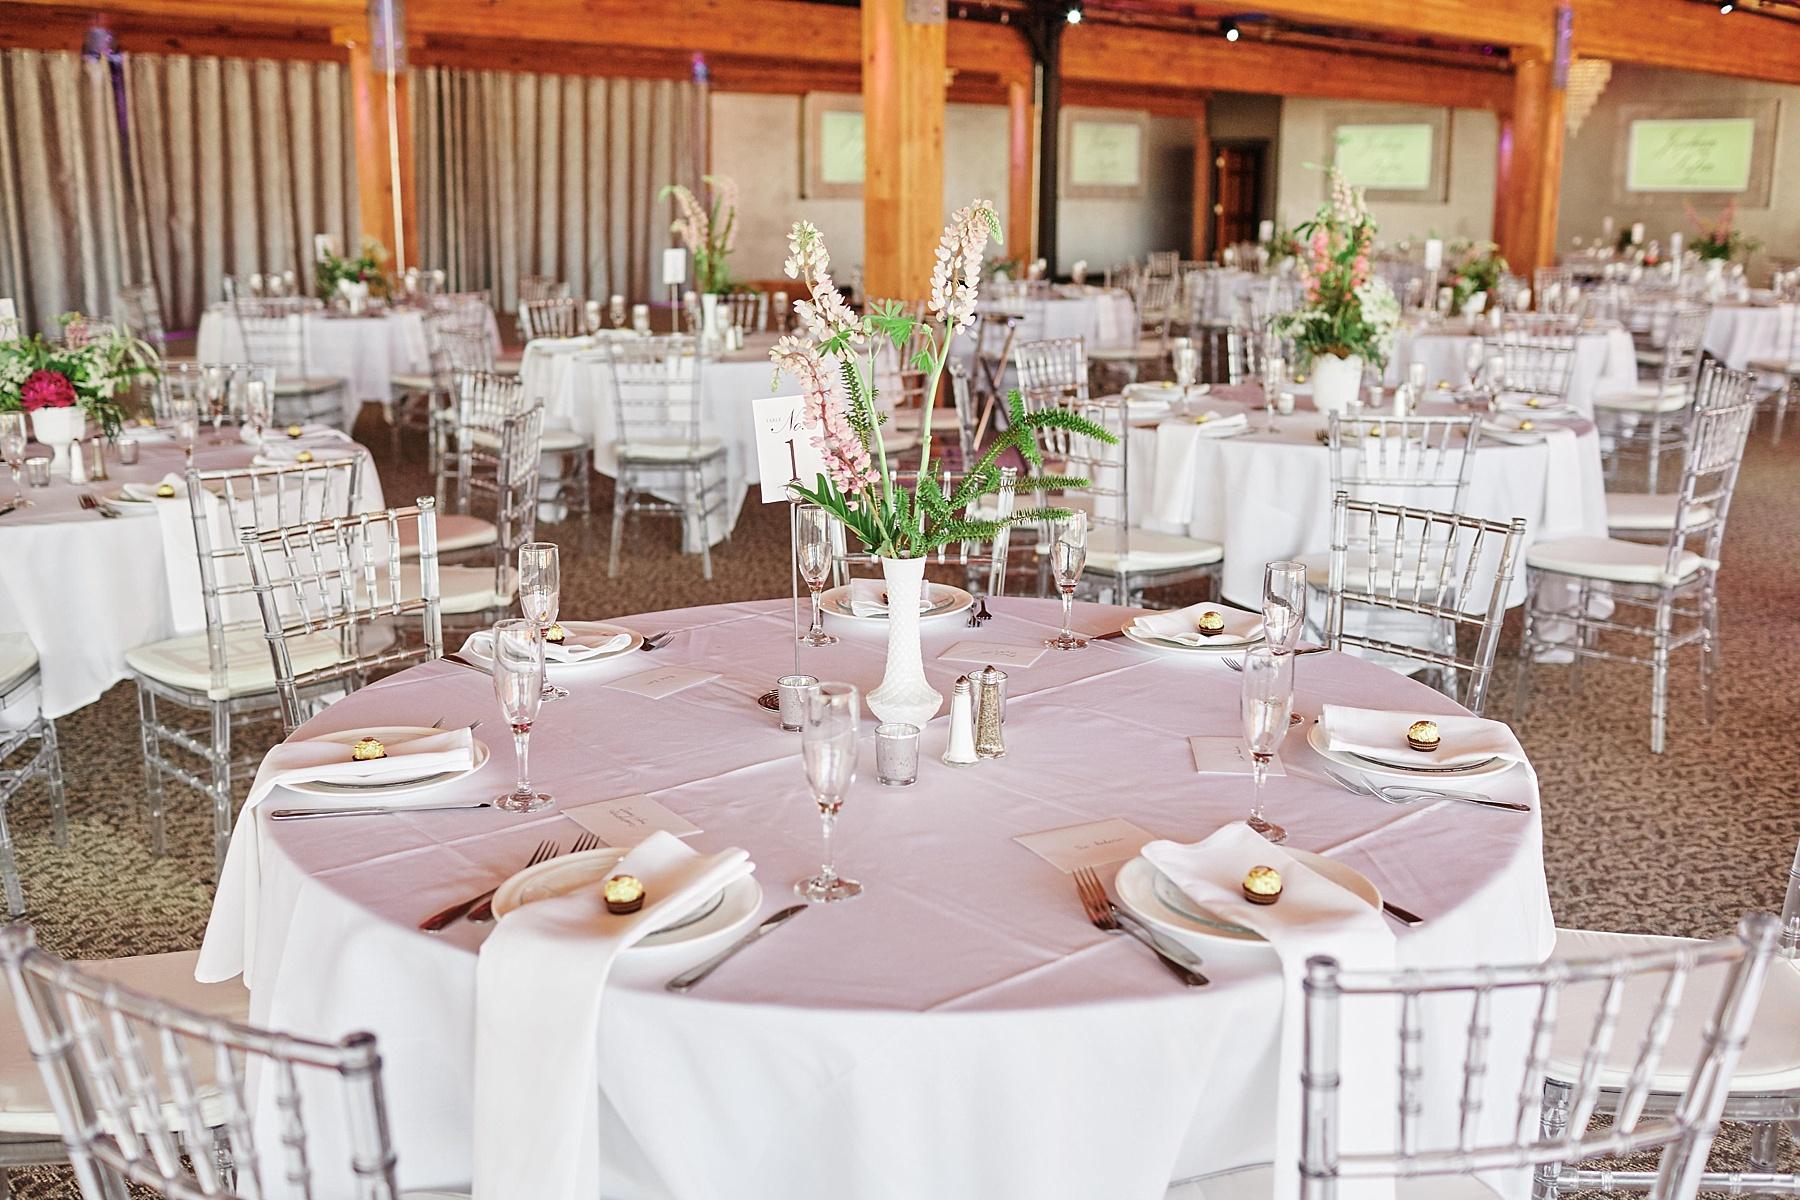 ABULAE-Wedding-Saint-paul-MN-Josh-Sofia-Wedding-Mears-Park_0878.jpg